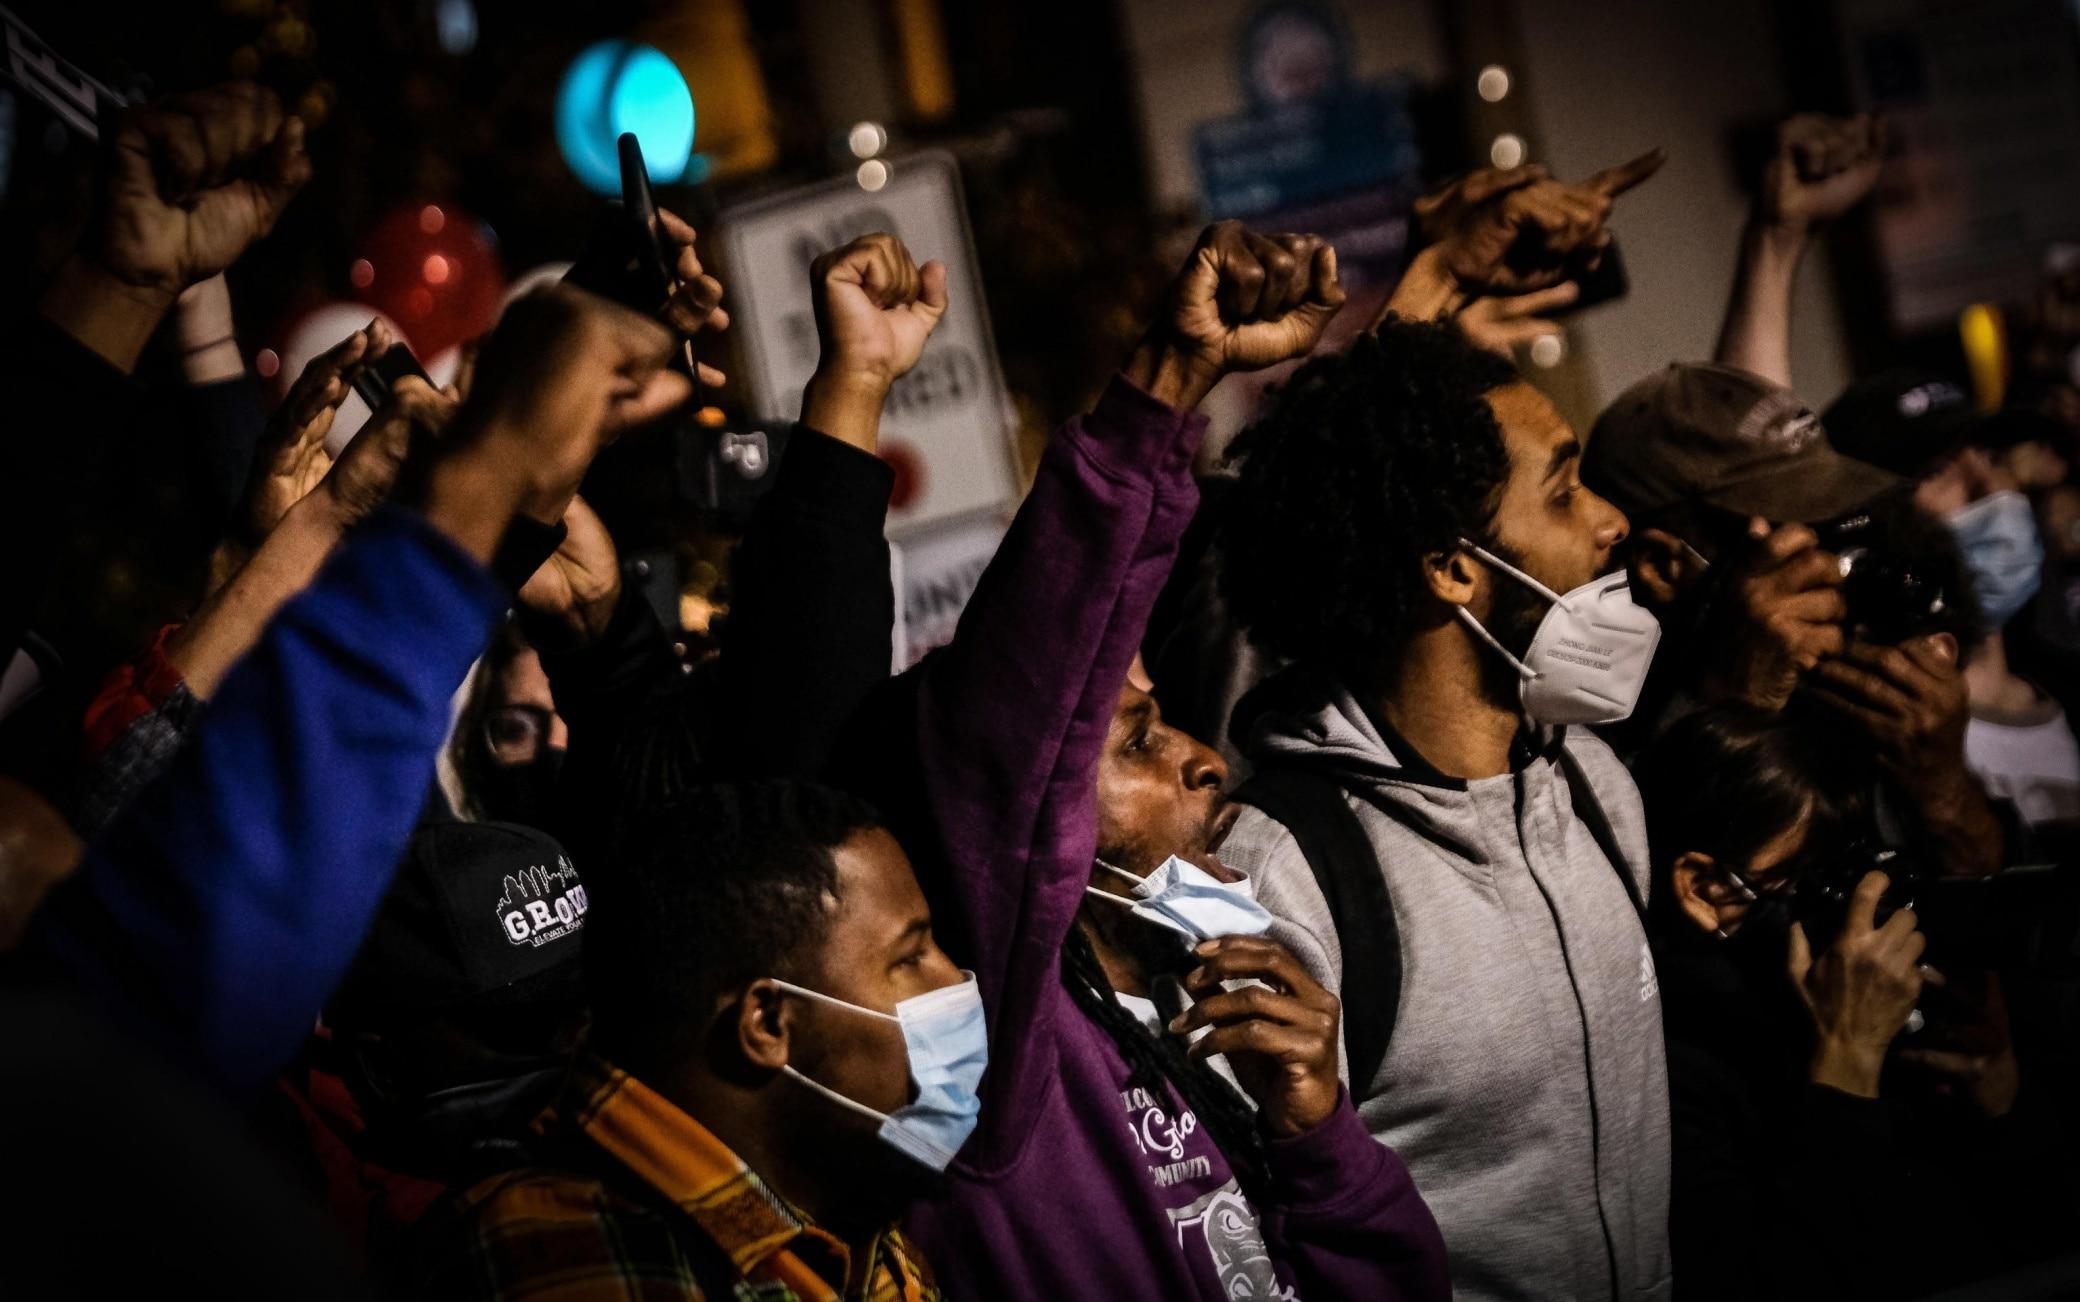 Manifestanti del movimento Black Lives Matter